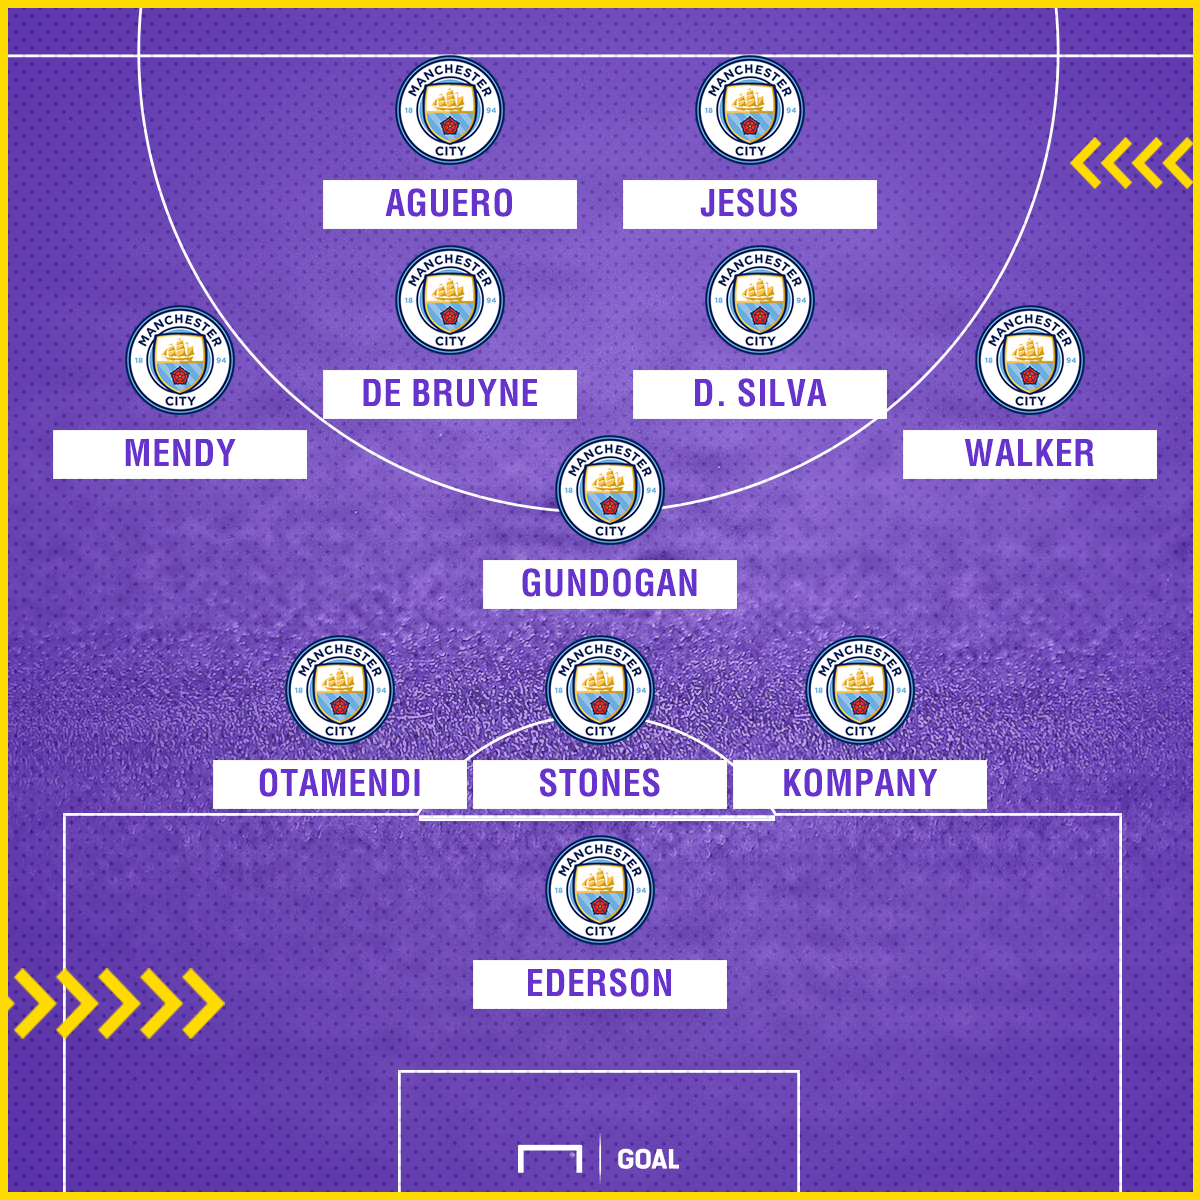 Man City 2017-18 line-up